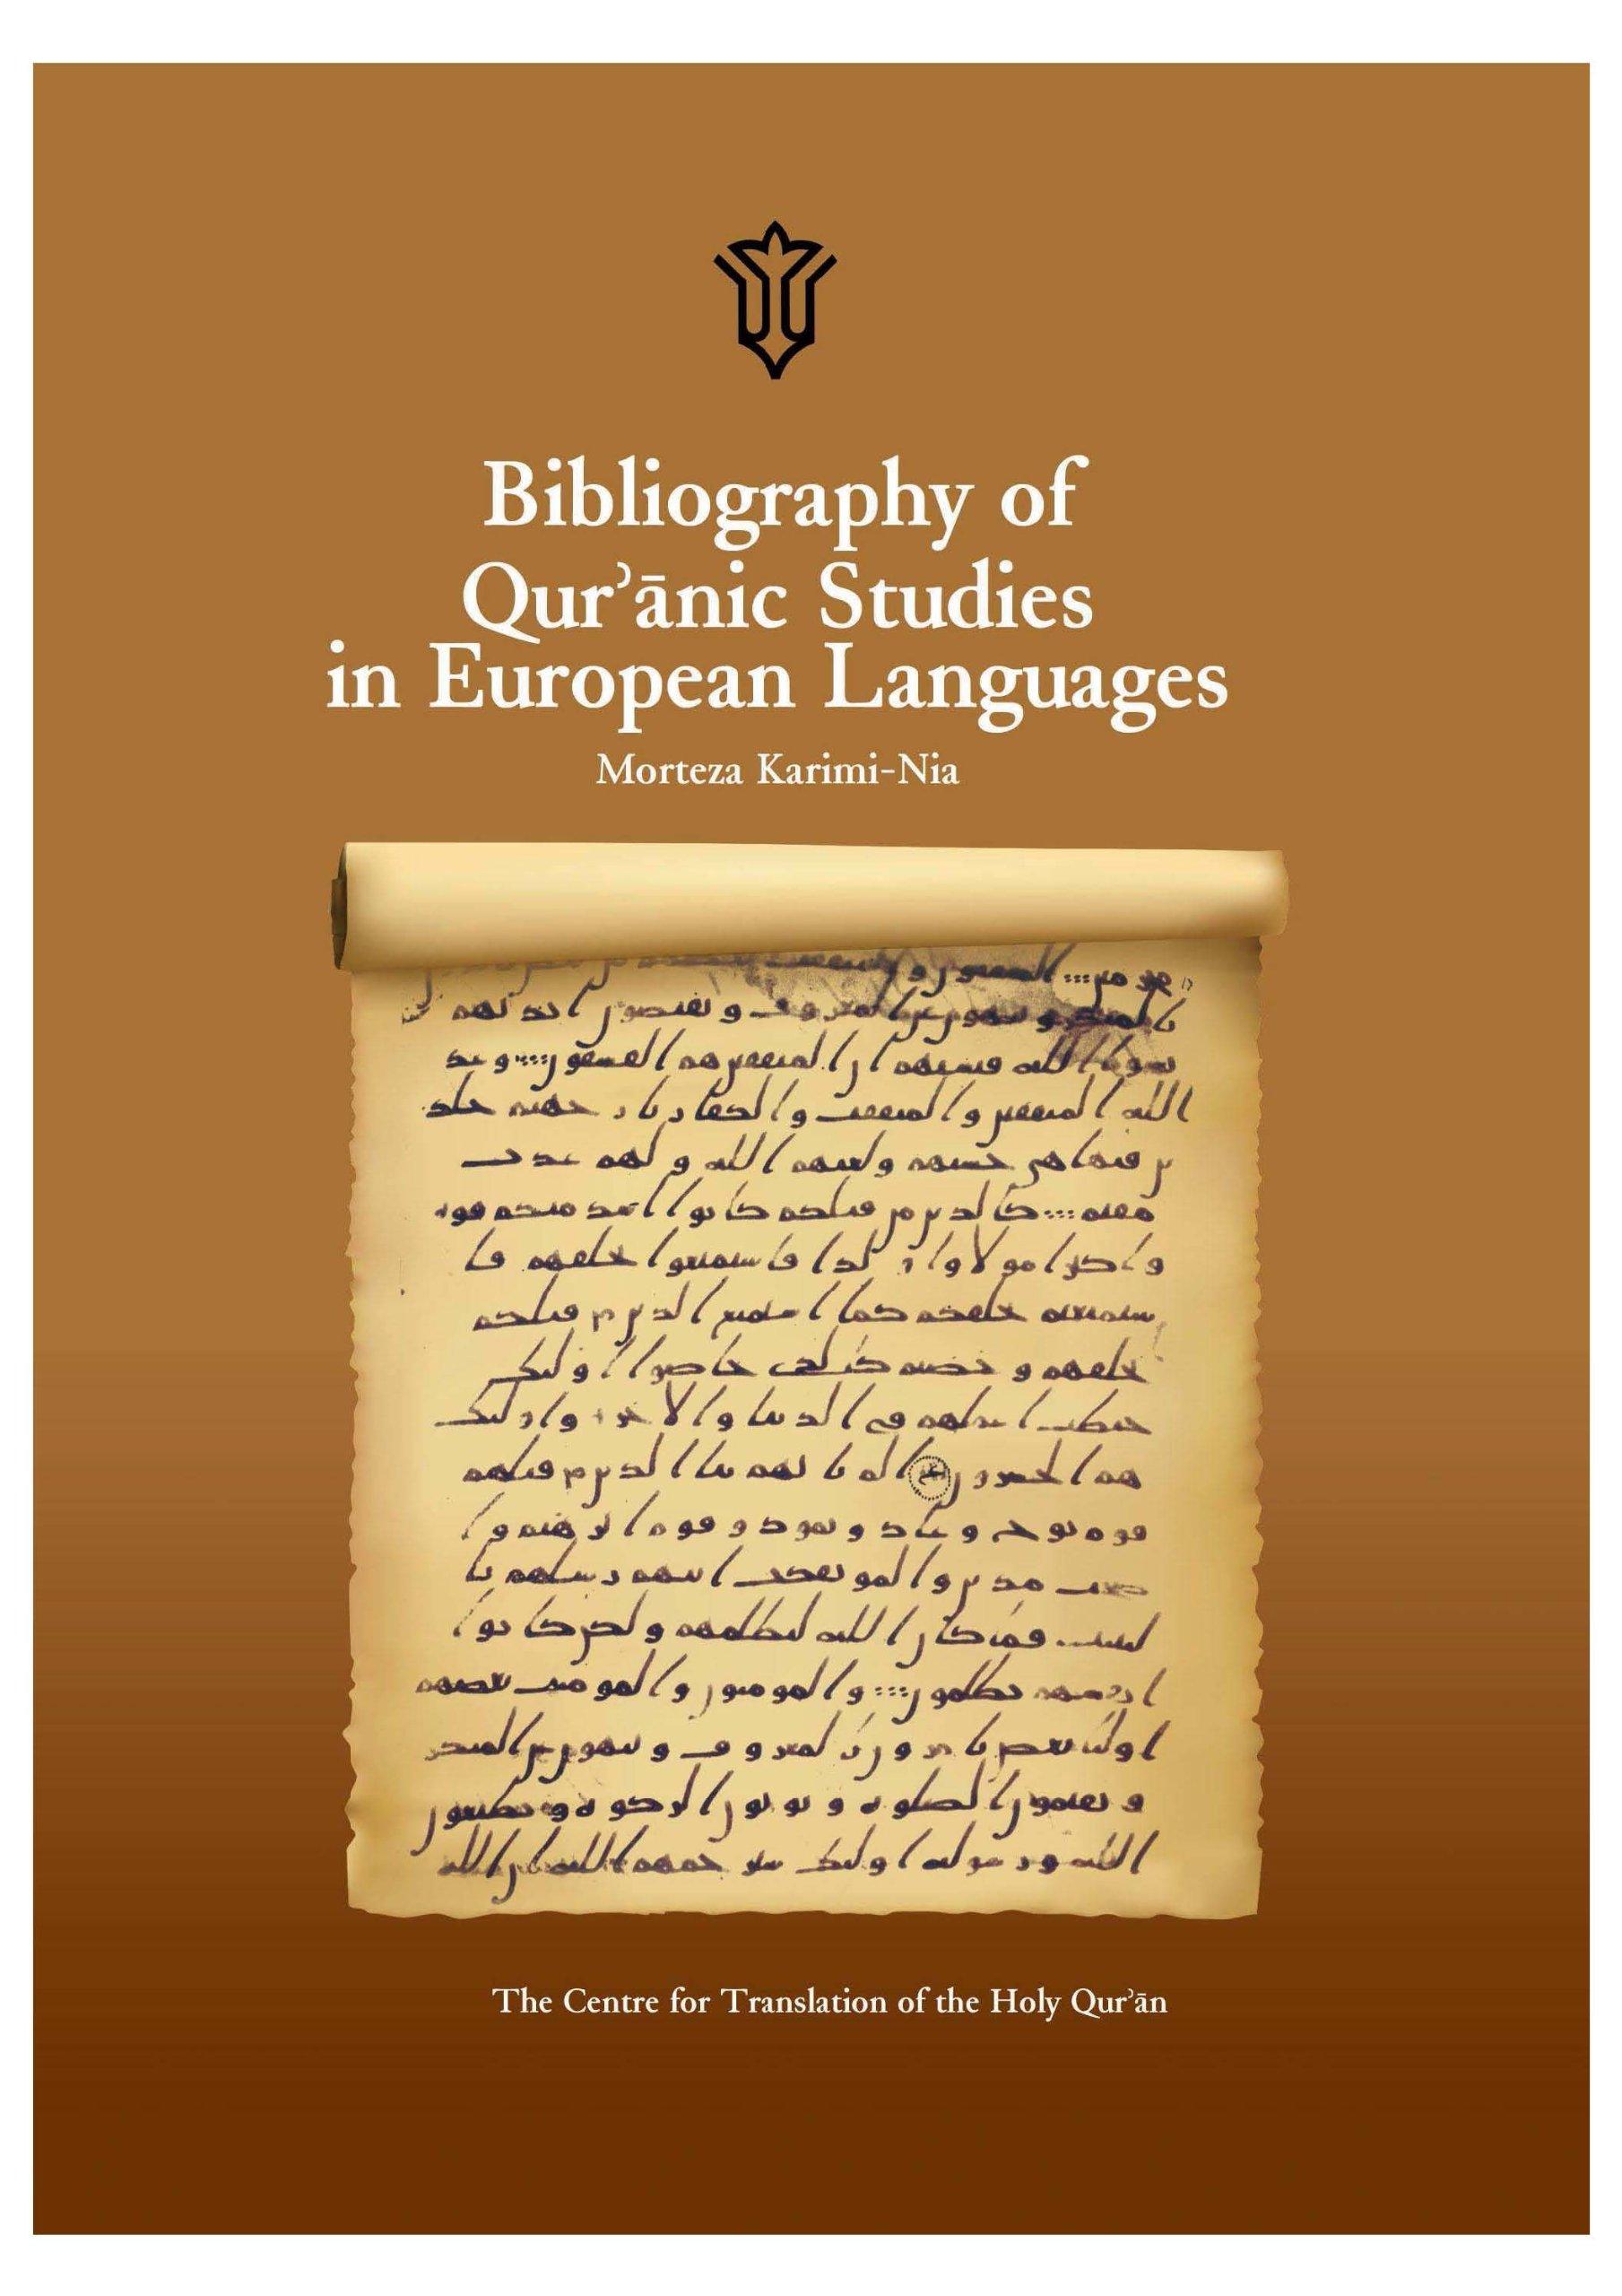 Bibliography of Qur'anic Studies in European Languages